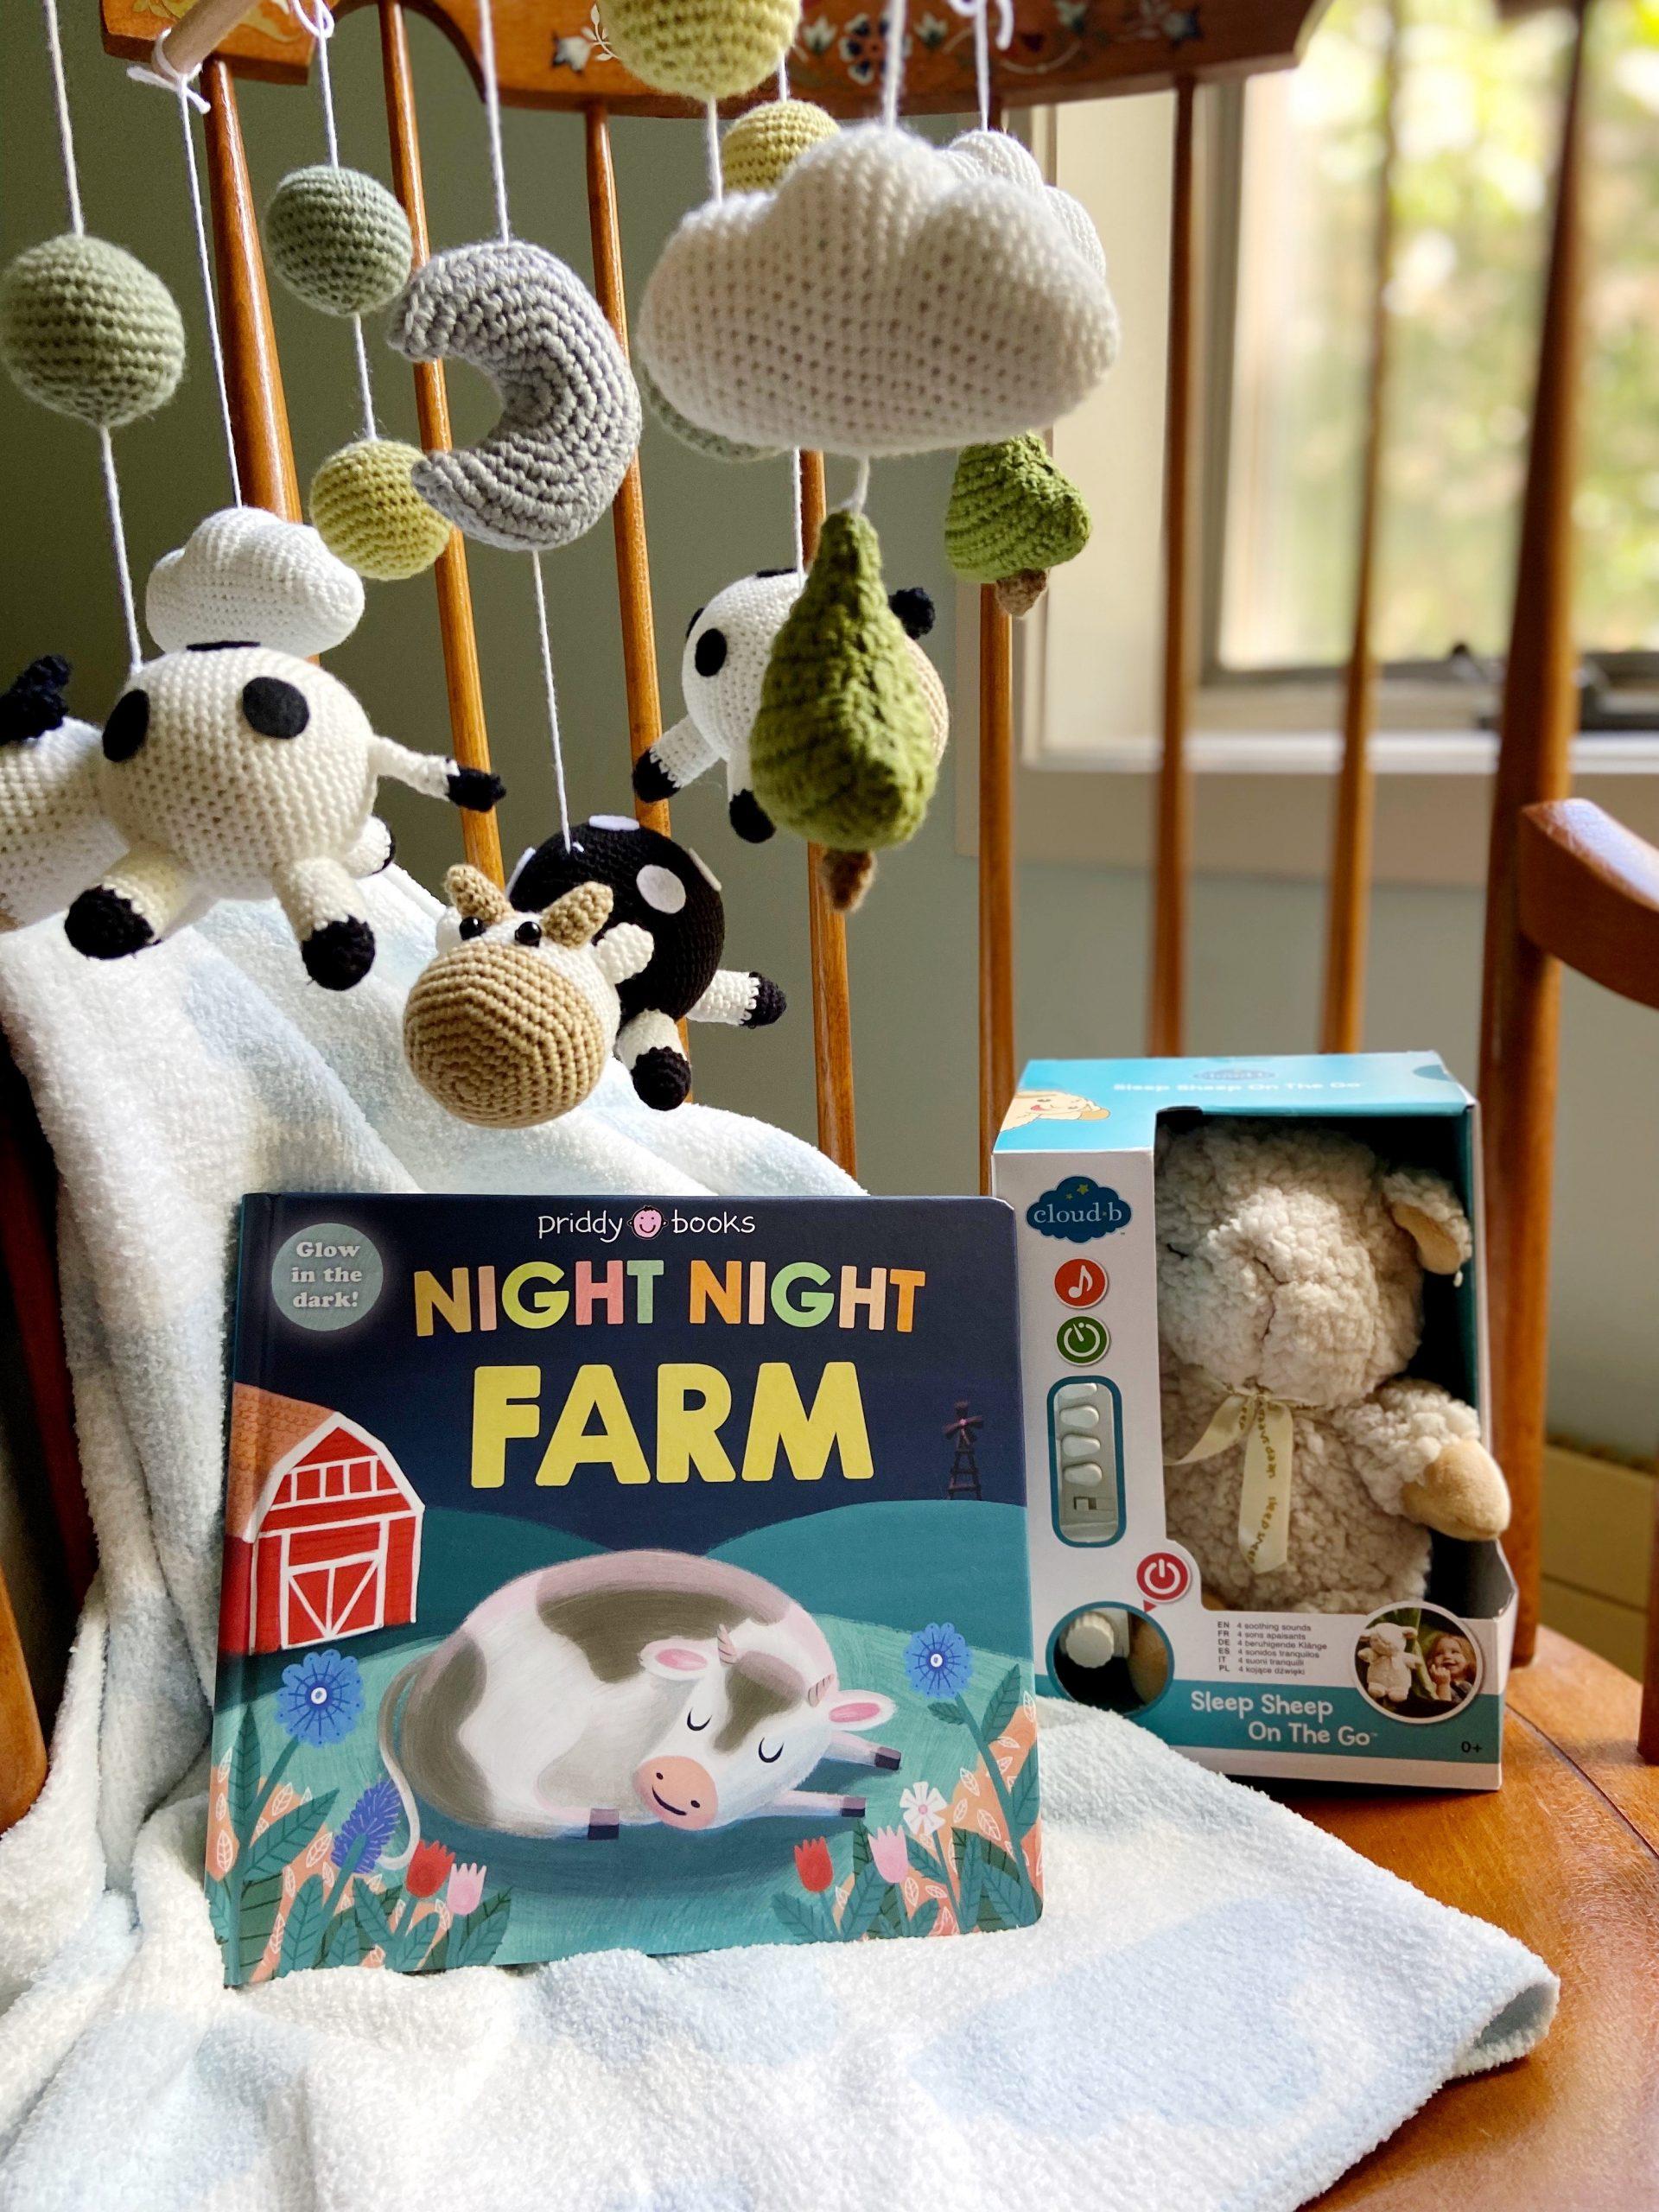 Night Night Farm Sweepstakes Prize